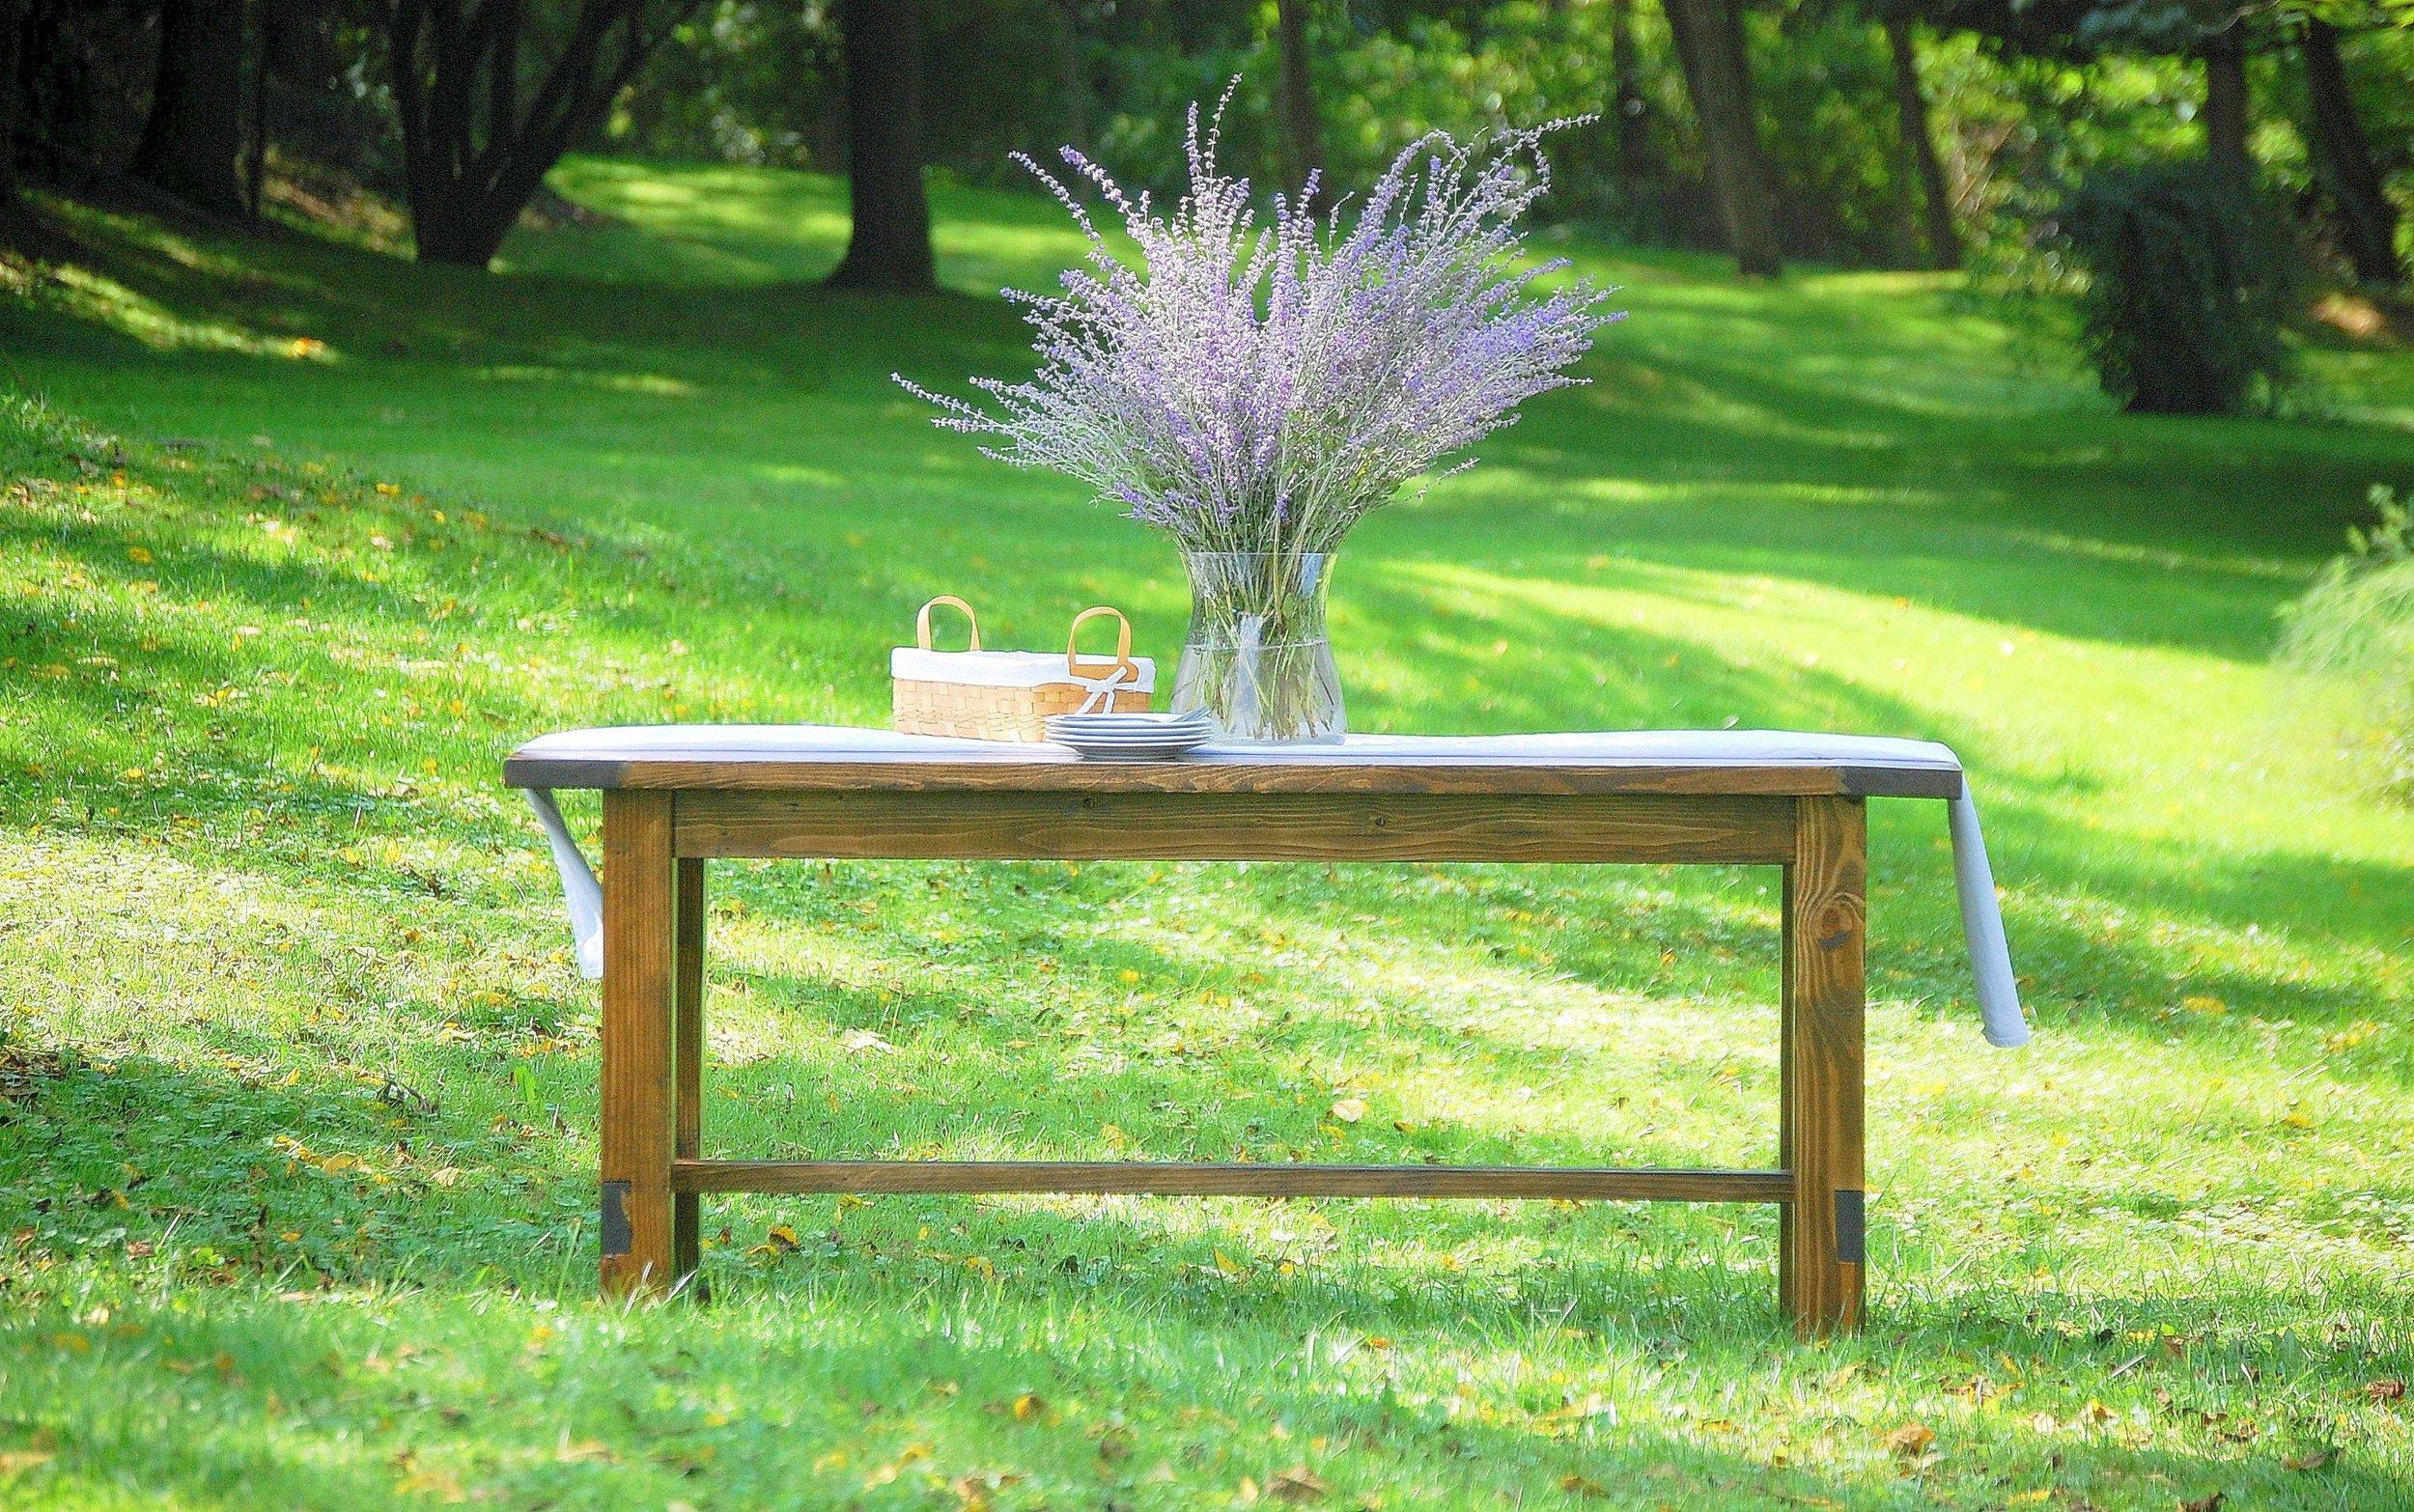 Penn Rustics_Farmhouse Table that started it all.jpg